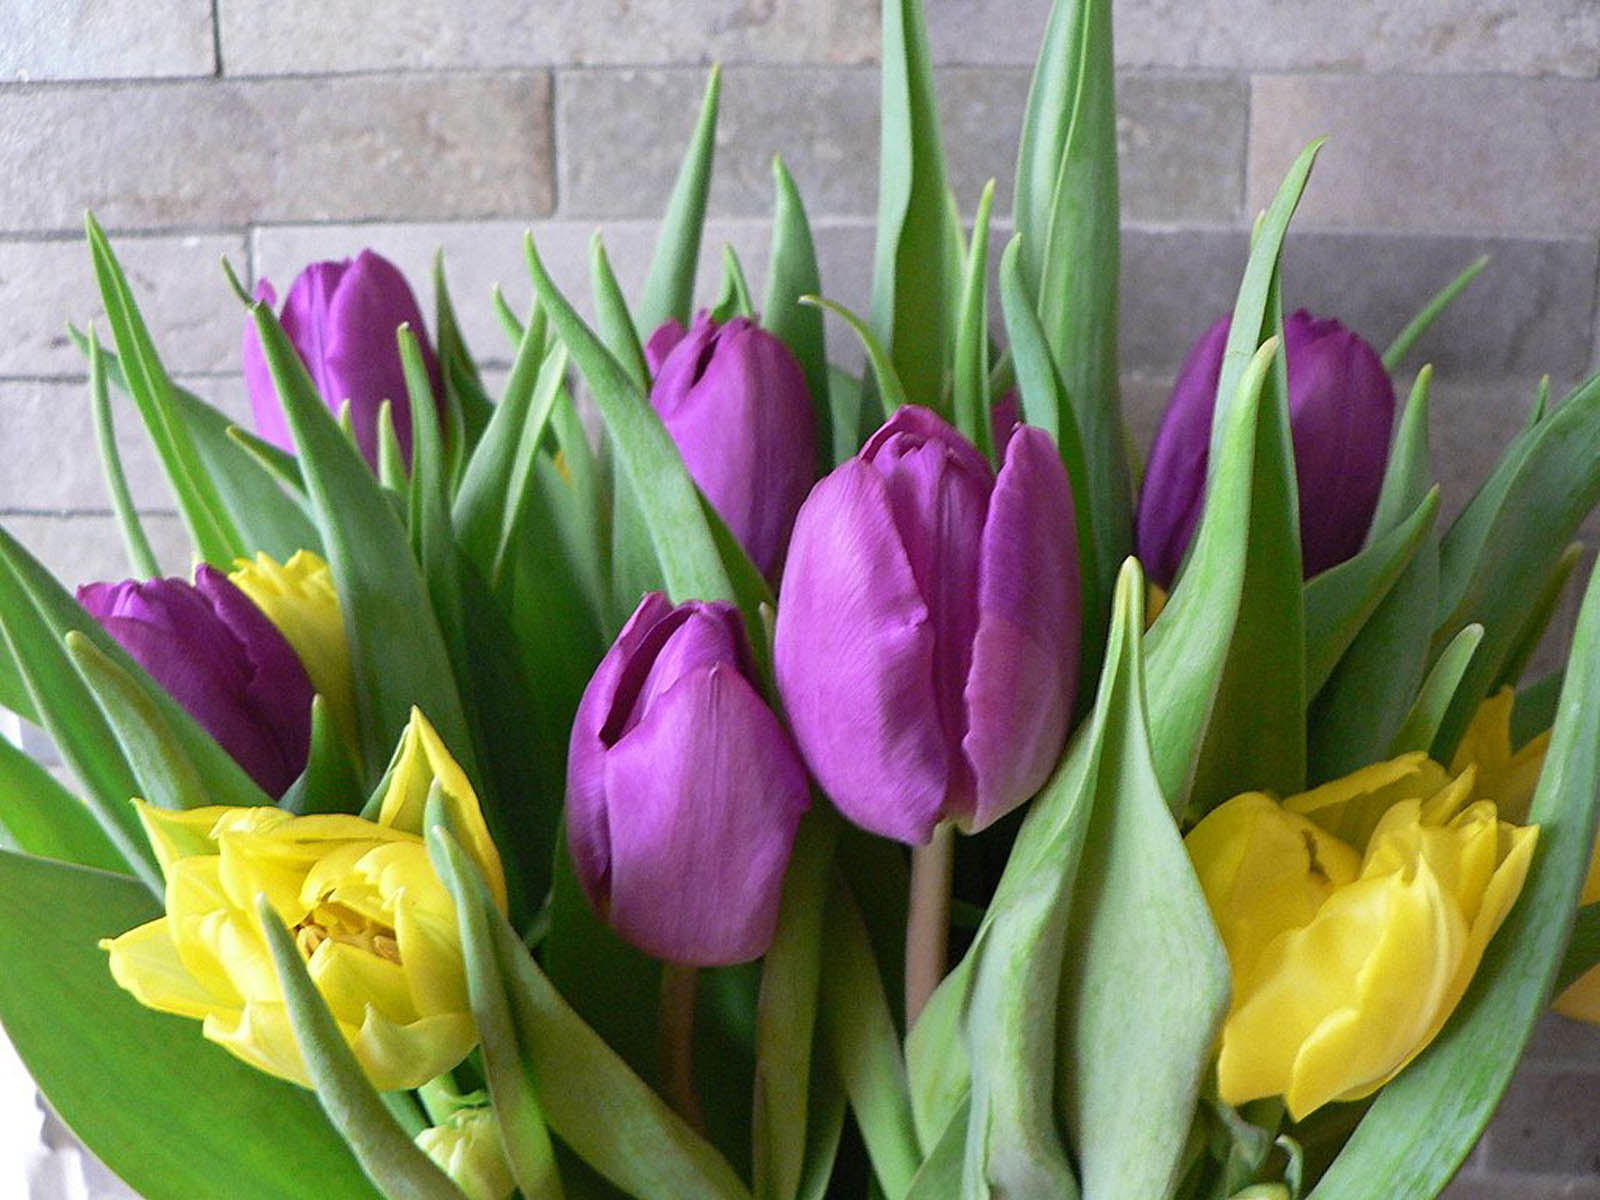 Purple Tulips Flowers Wallpapers ~ Desktop Wallpaper